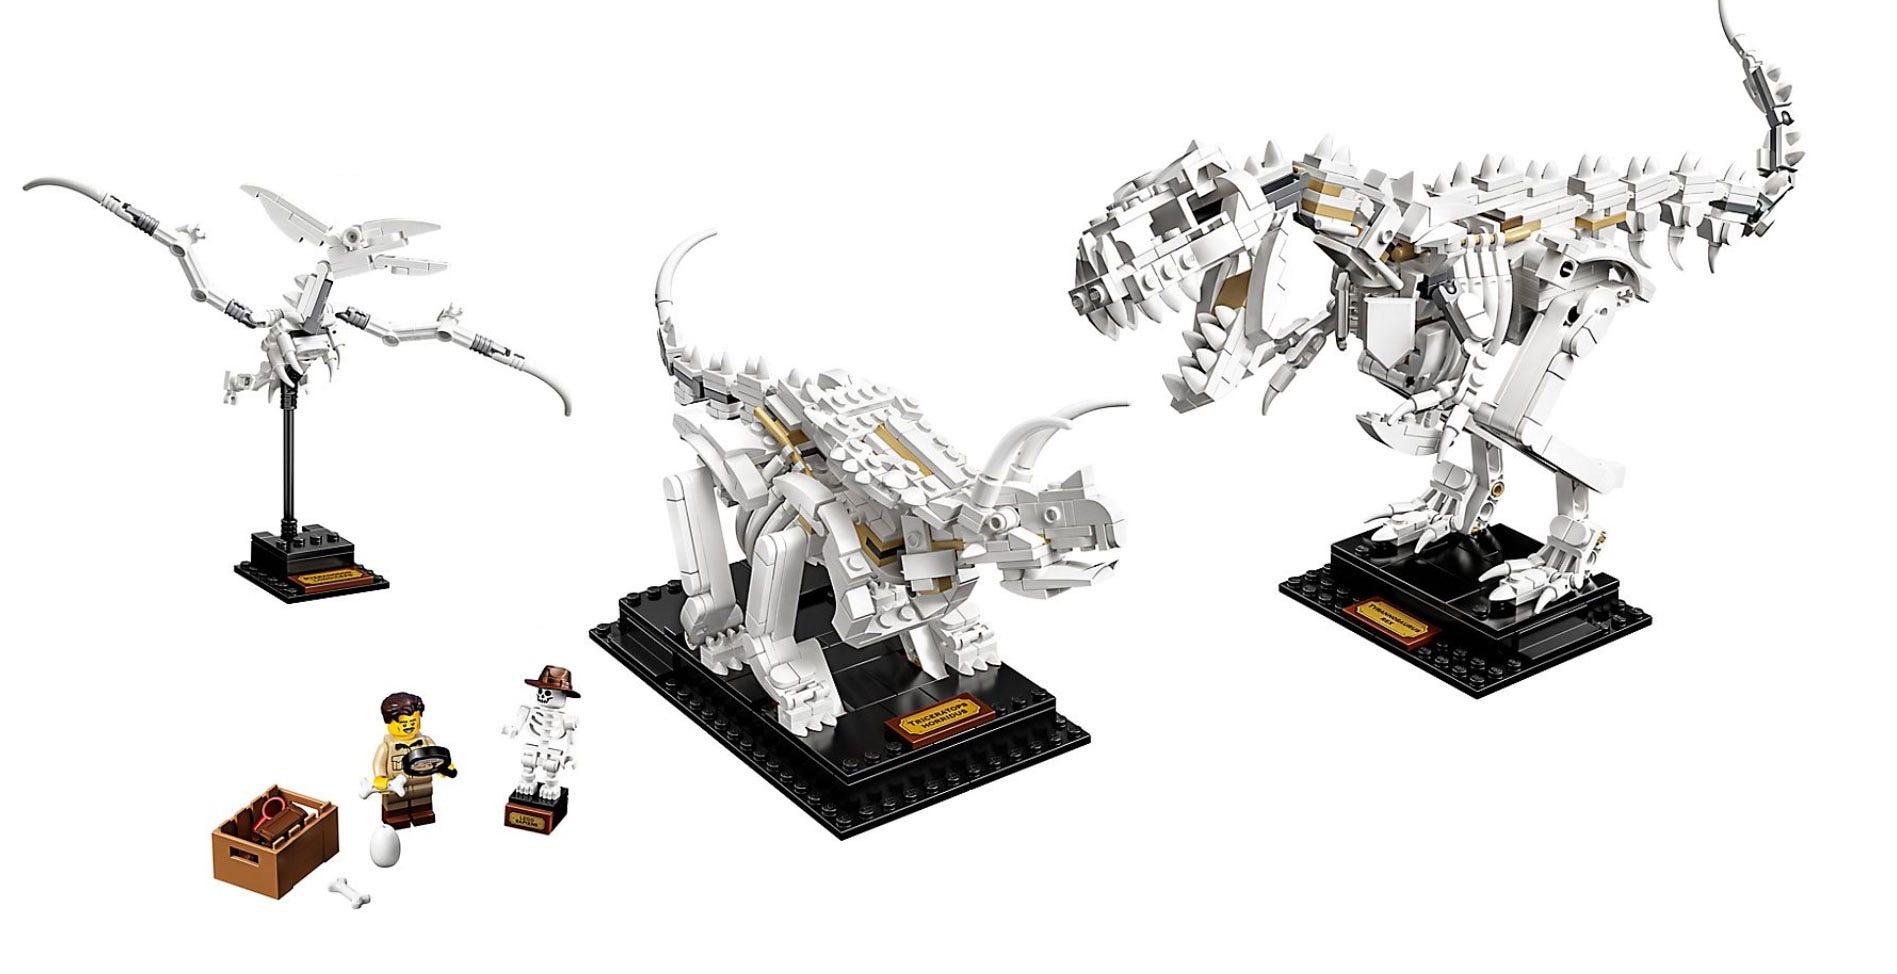 The LEGO Dinosaur Museum Set.